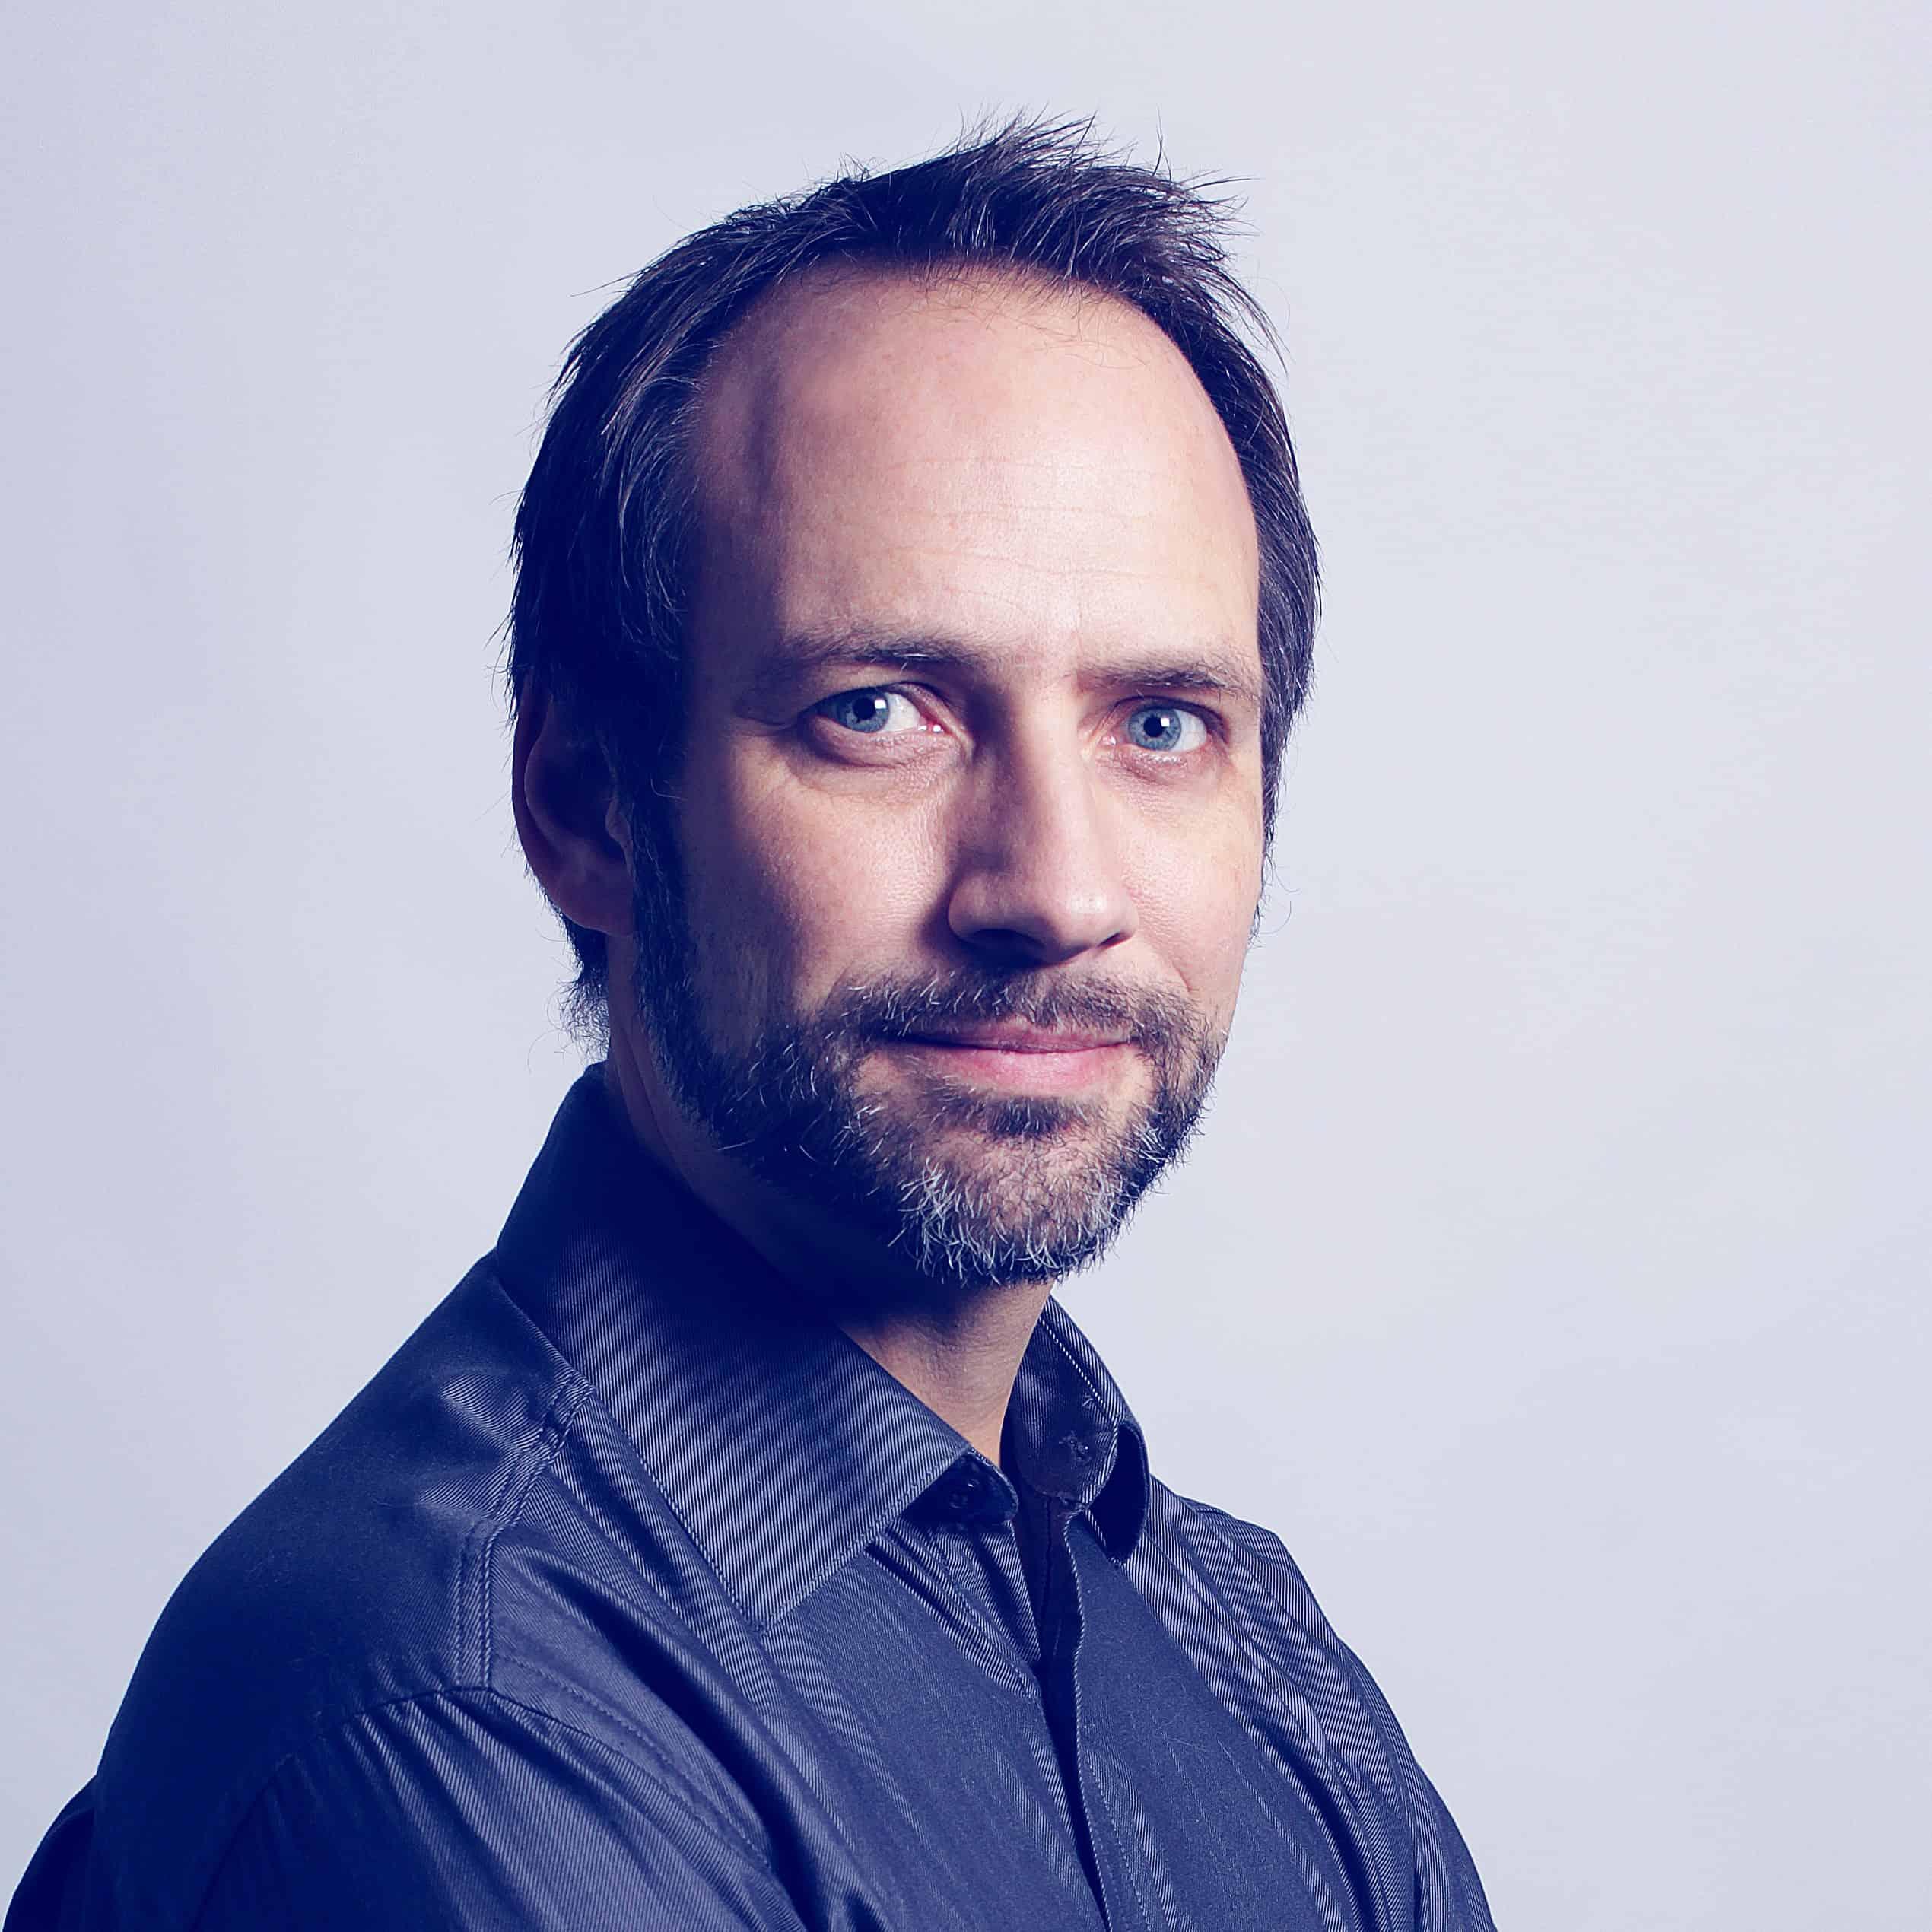 Daniel Forslund